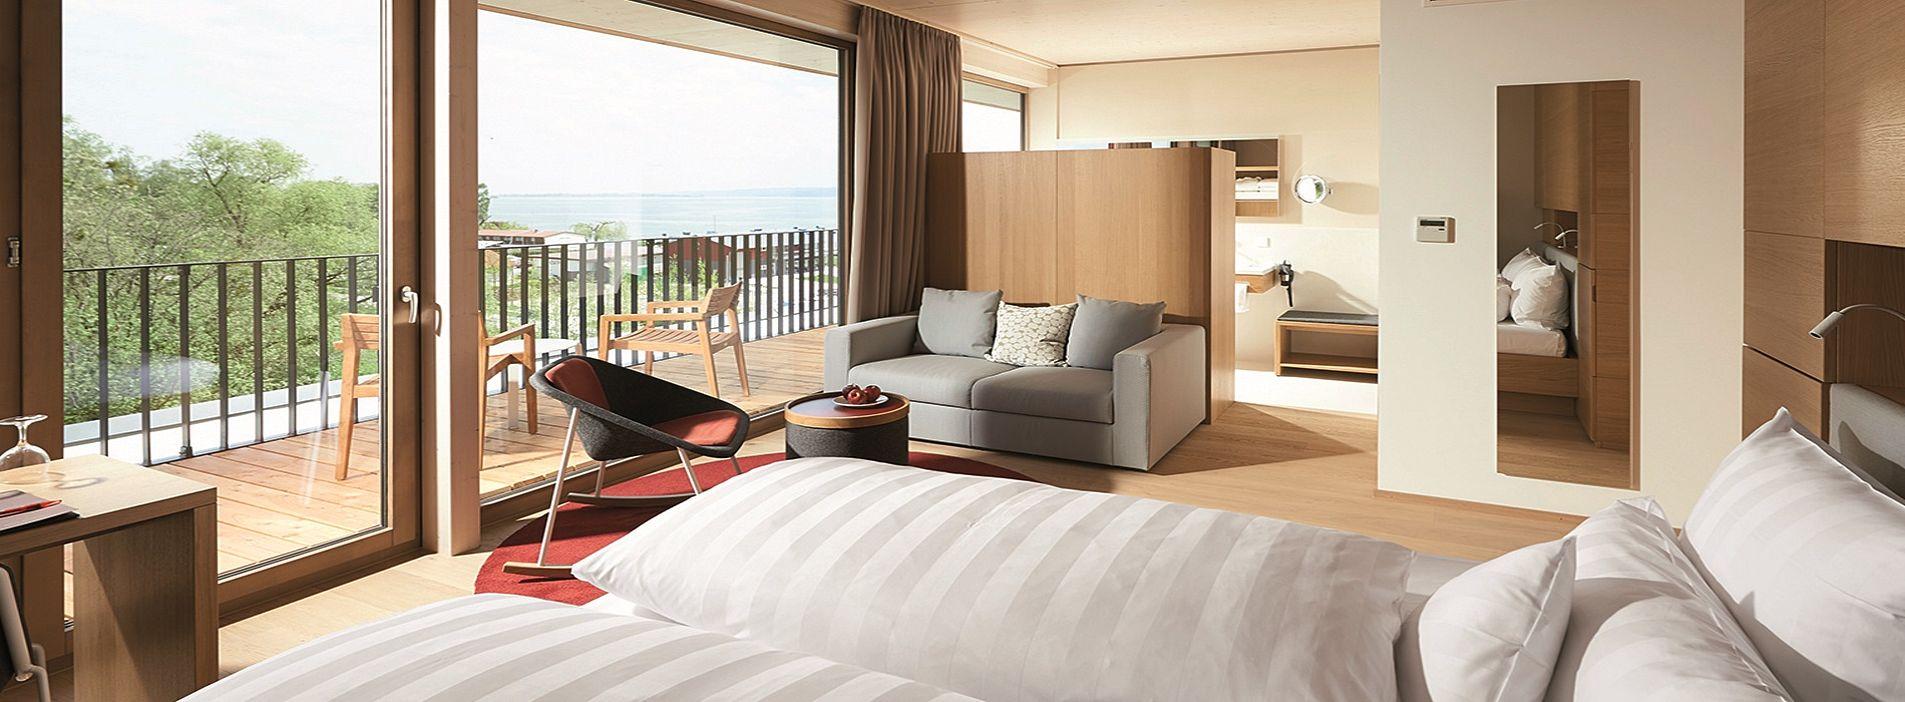 bora preise finest bora preise with bora preise great niedrige preise tglich damen lowa bora. Black Bedroom Furniture Sets. Home Design Ideas